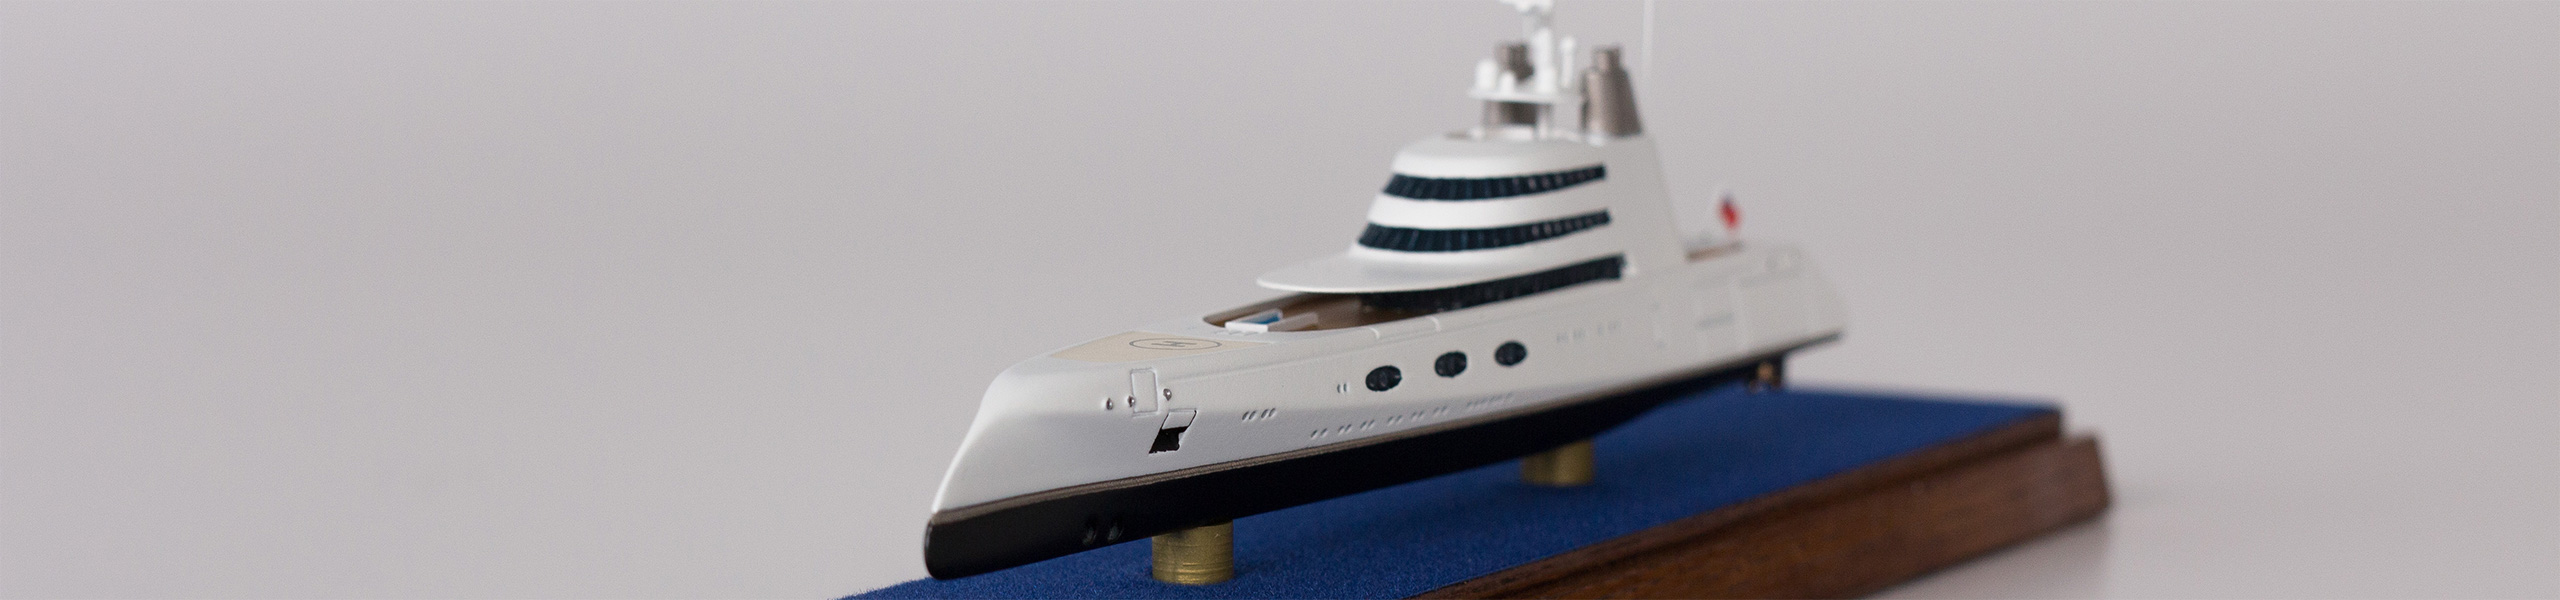 1:1250 Modell der Superyacht A